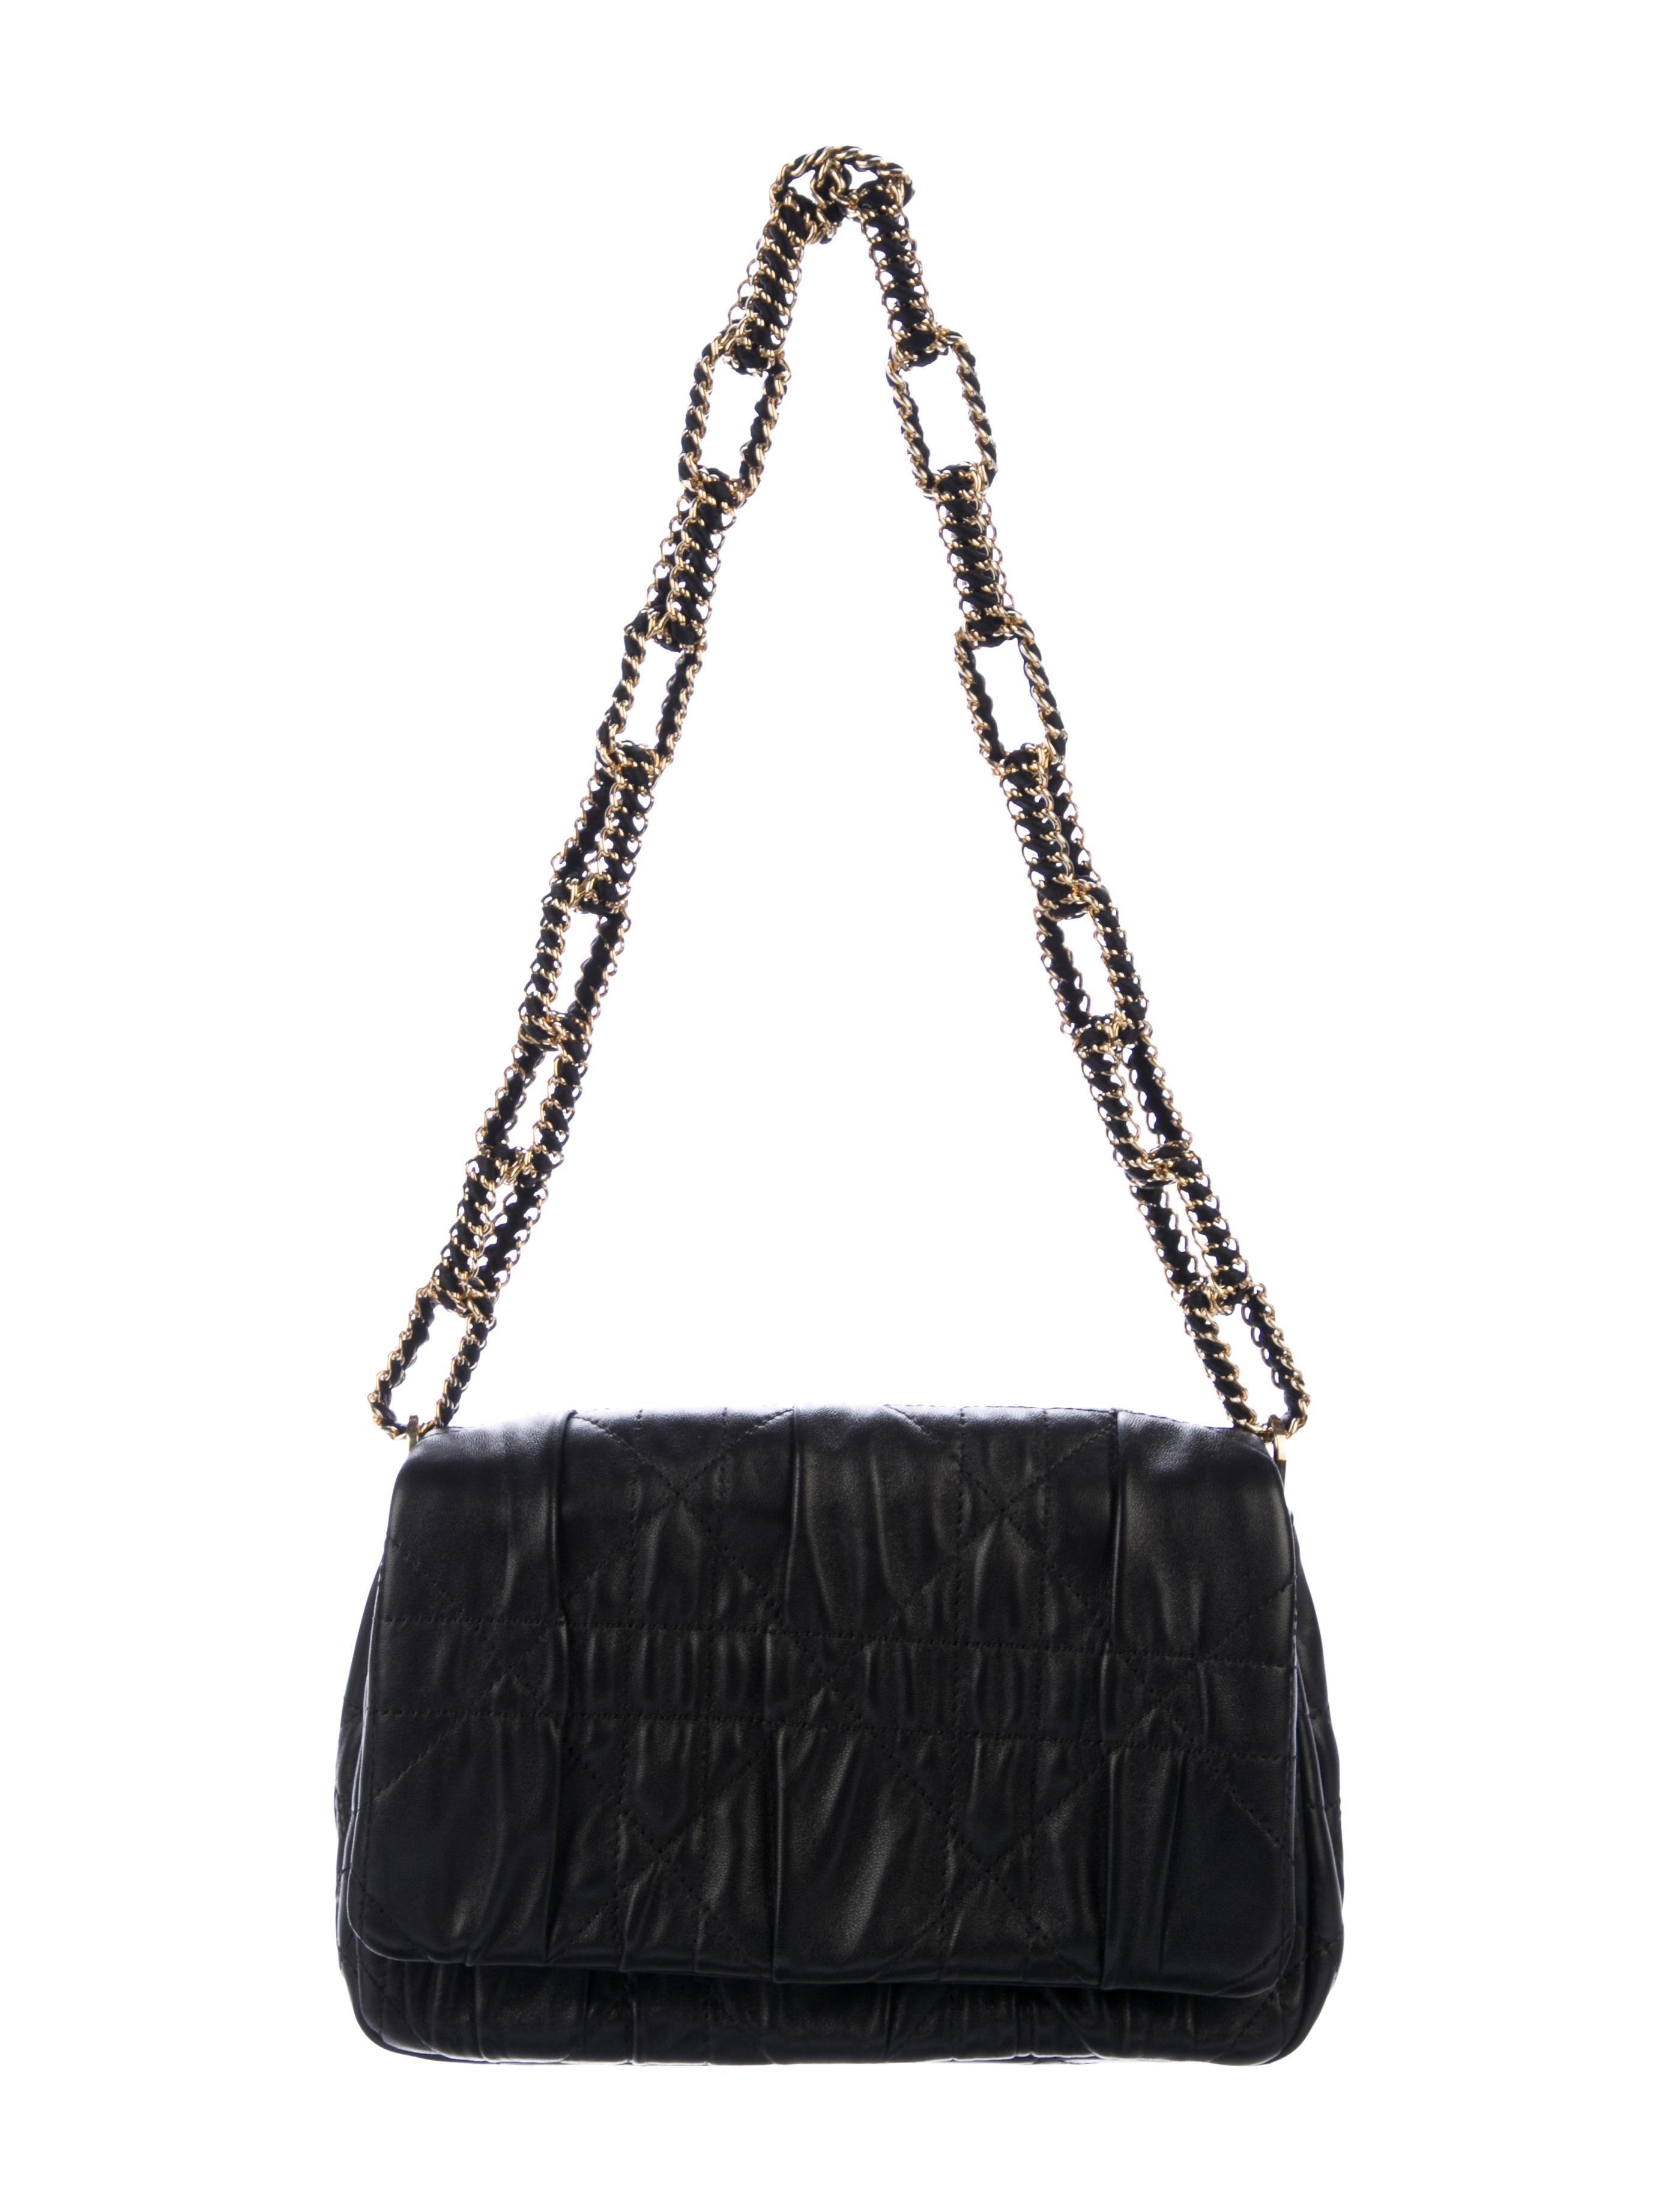 da04a2978ec7 Christian Dior Cannage Small Delidior Flap Bag - Handbags - CHR69481 ...